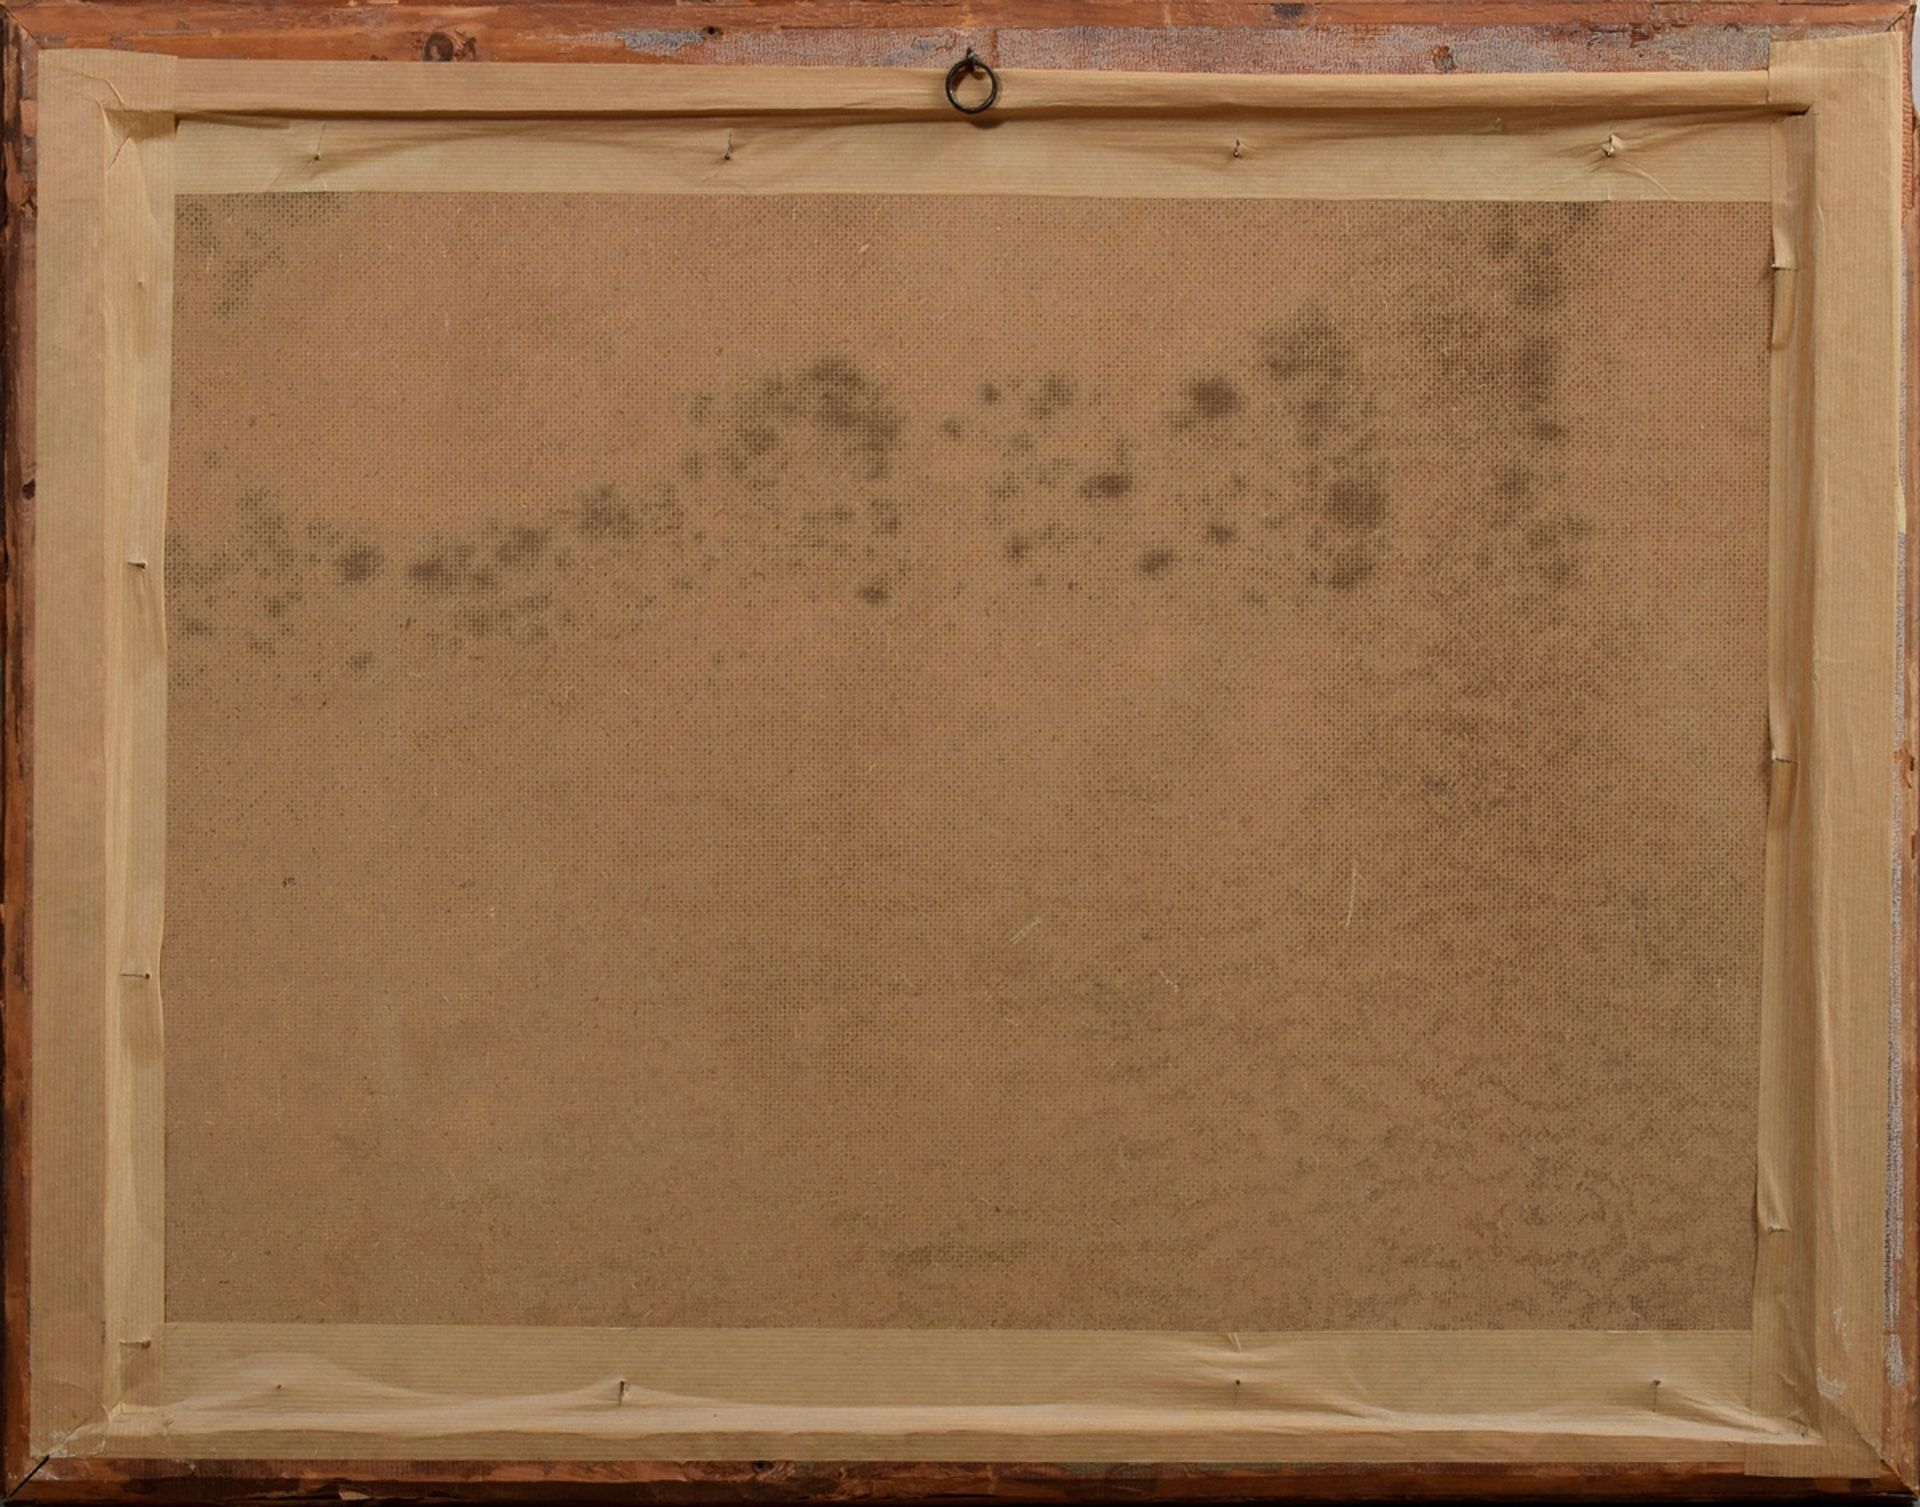 "Unbekannter Marinemaler des frühen 20.Jh. ""Kapit | Unknown marine painter of the early 20th c. ""Cap - Image 4 of 4"